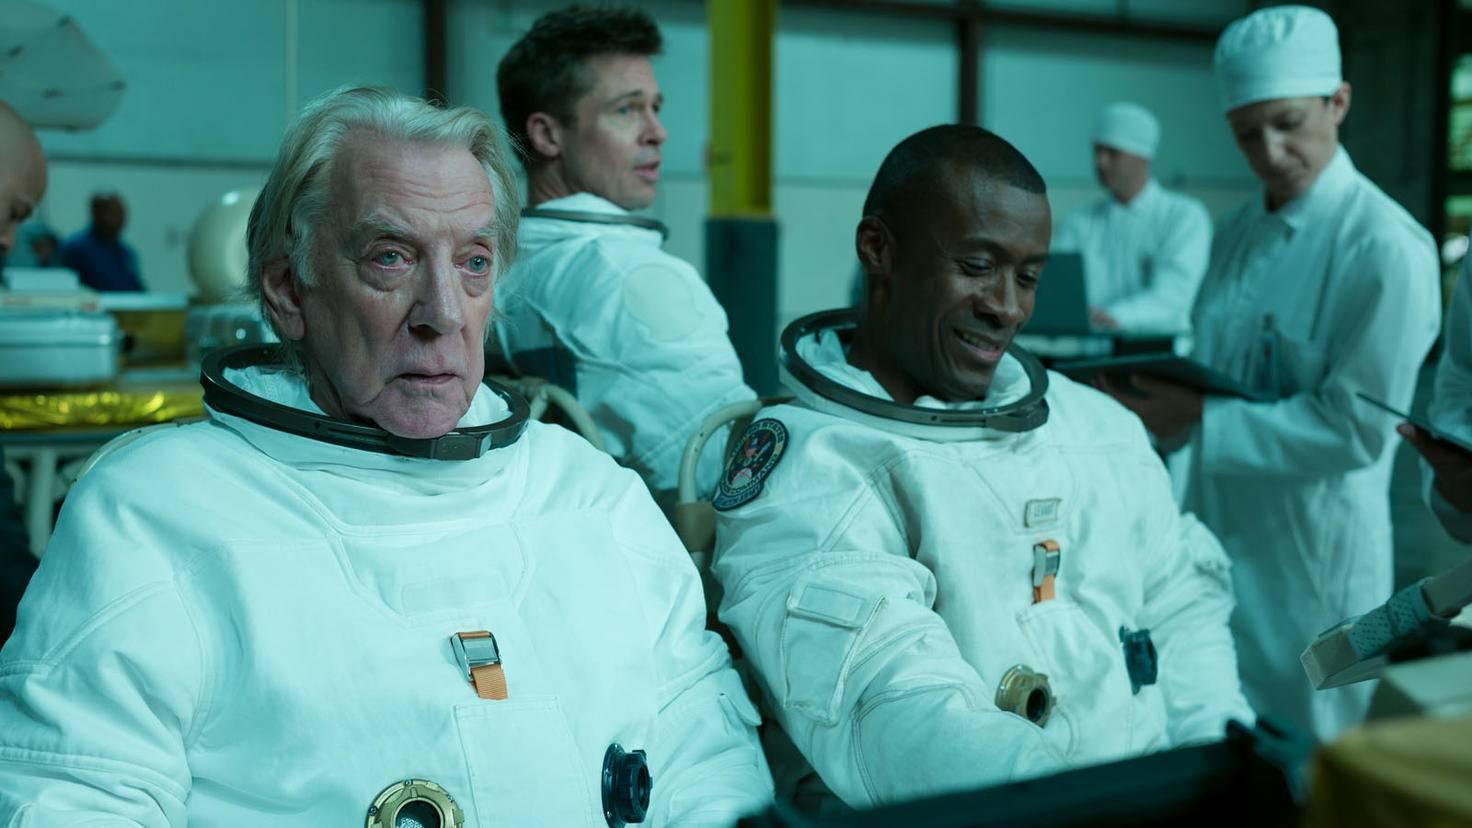 Ad Astra-Donald Sutherland-Brad Pitt-Sean Blakemore-Francois Duhamel-Twentieth Century Fox